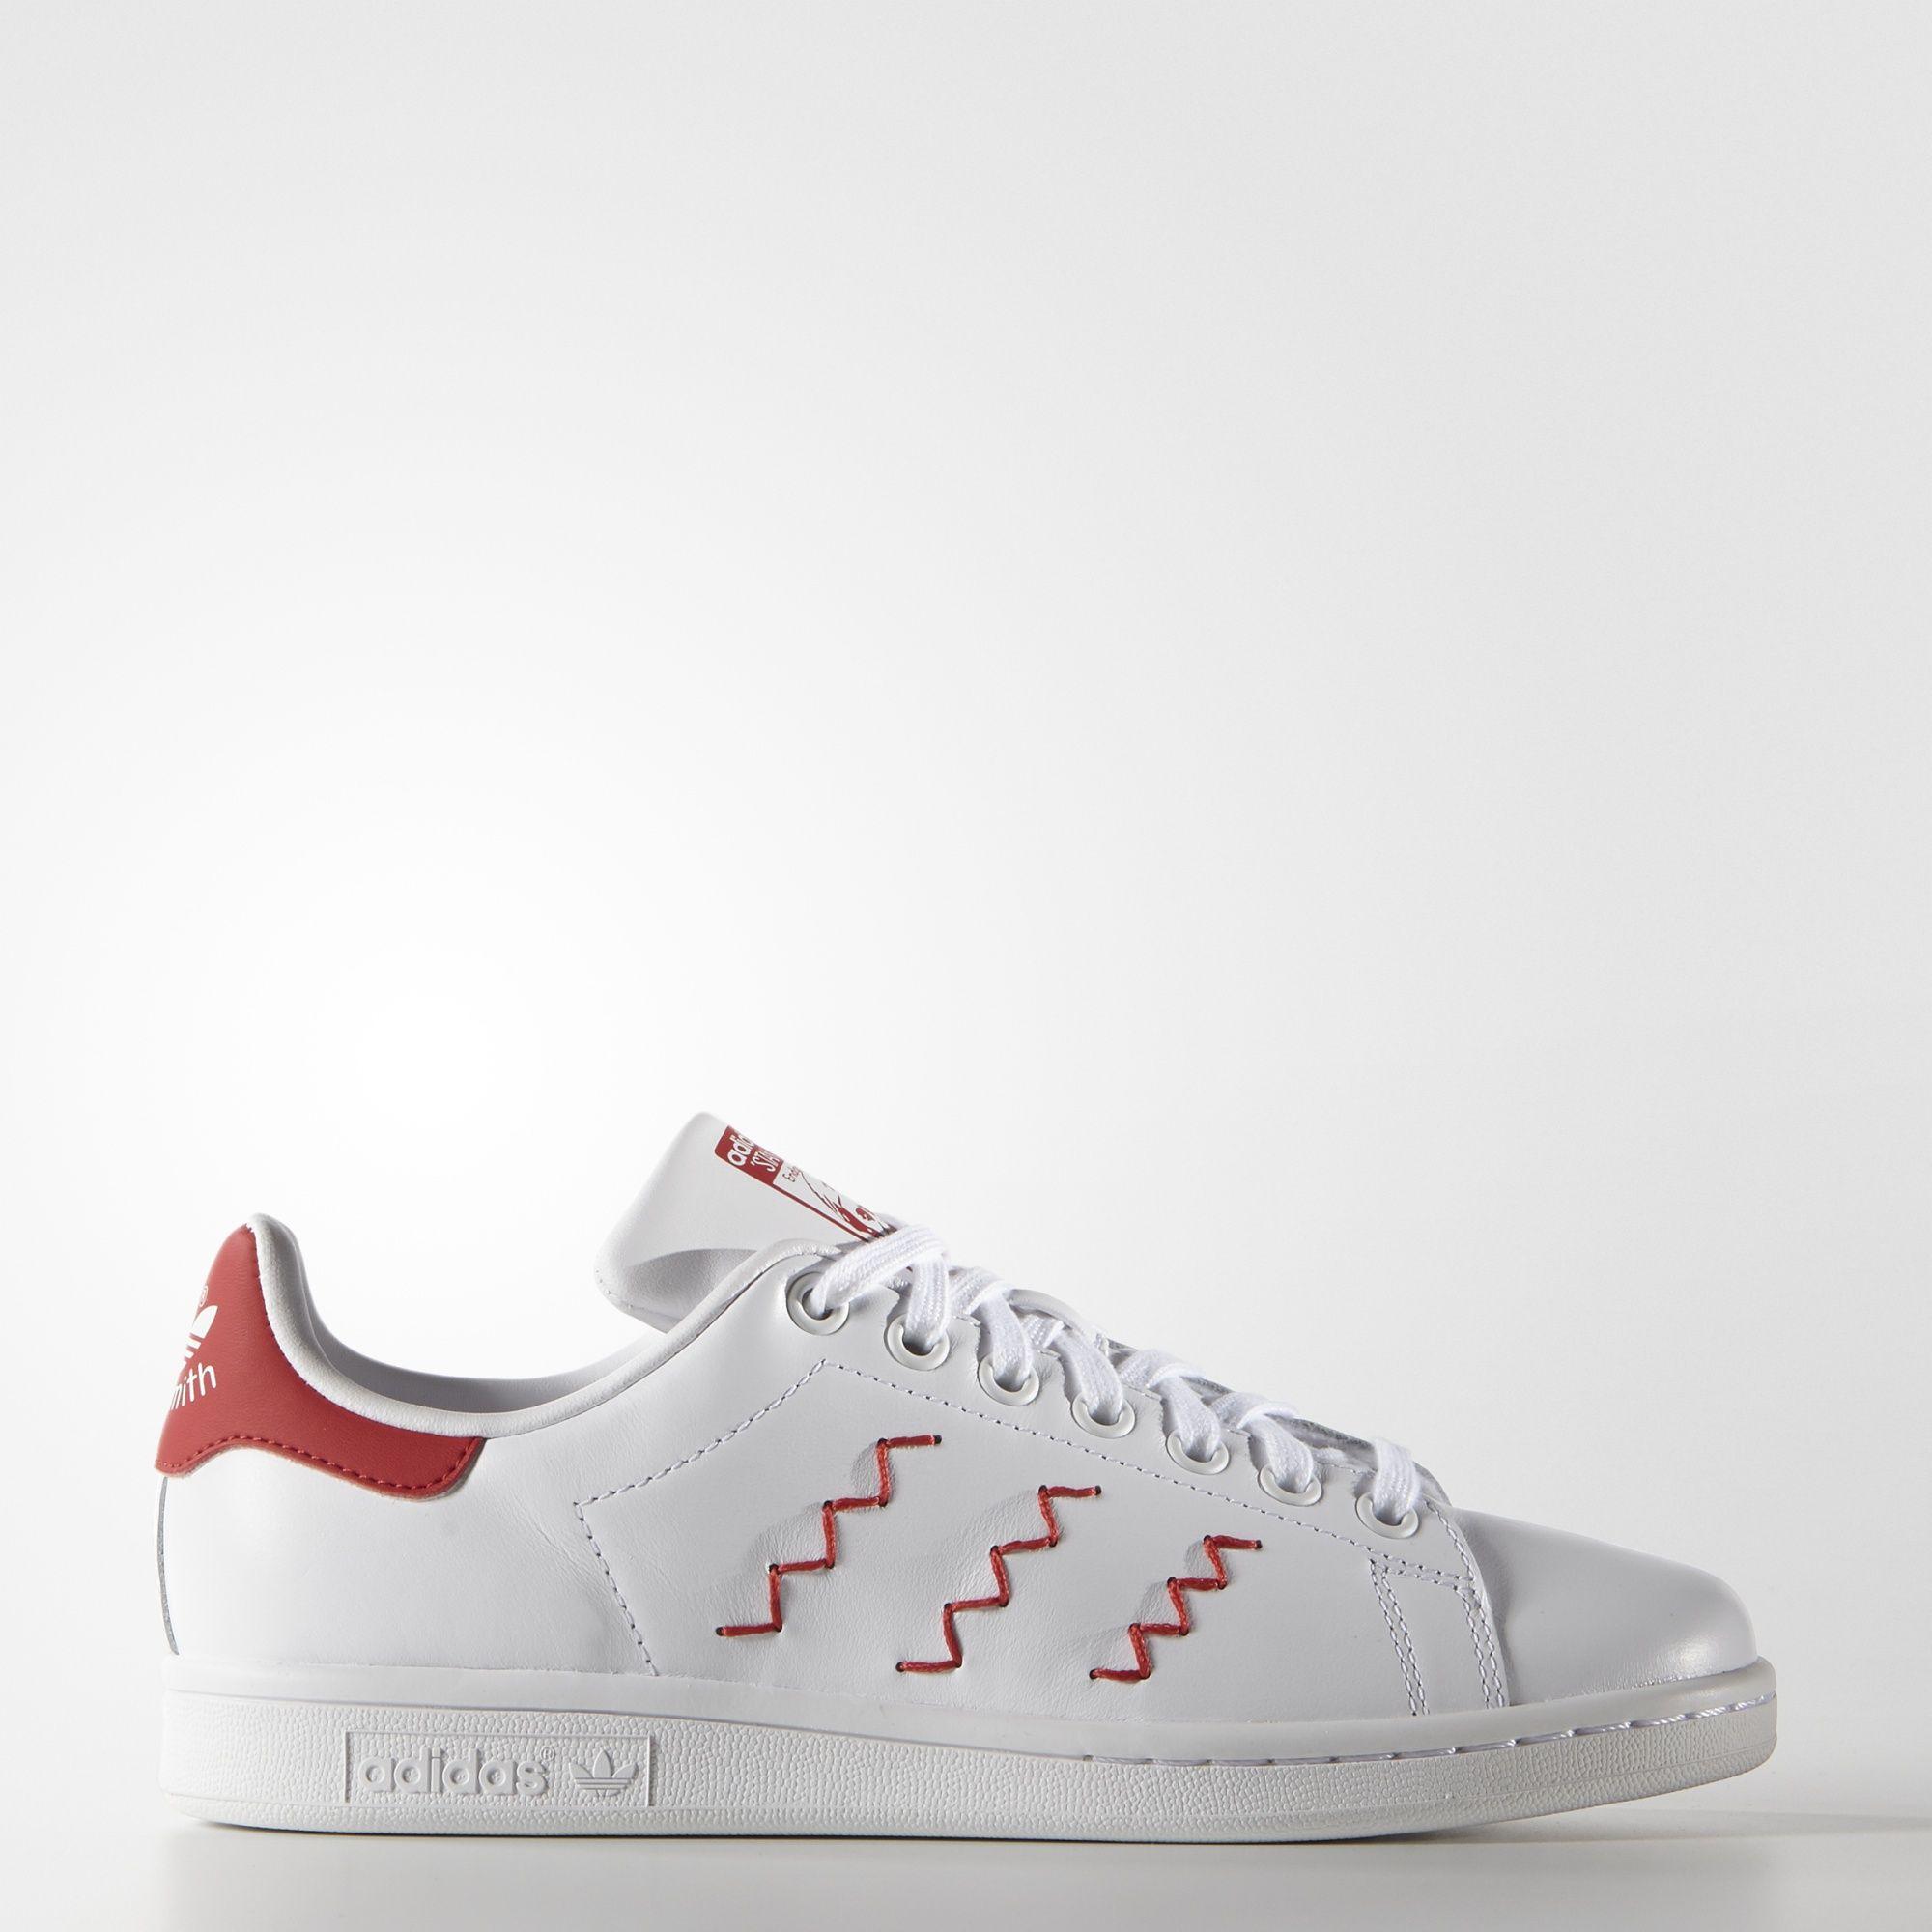 2scarpa adidas stan smith